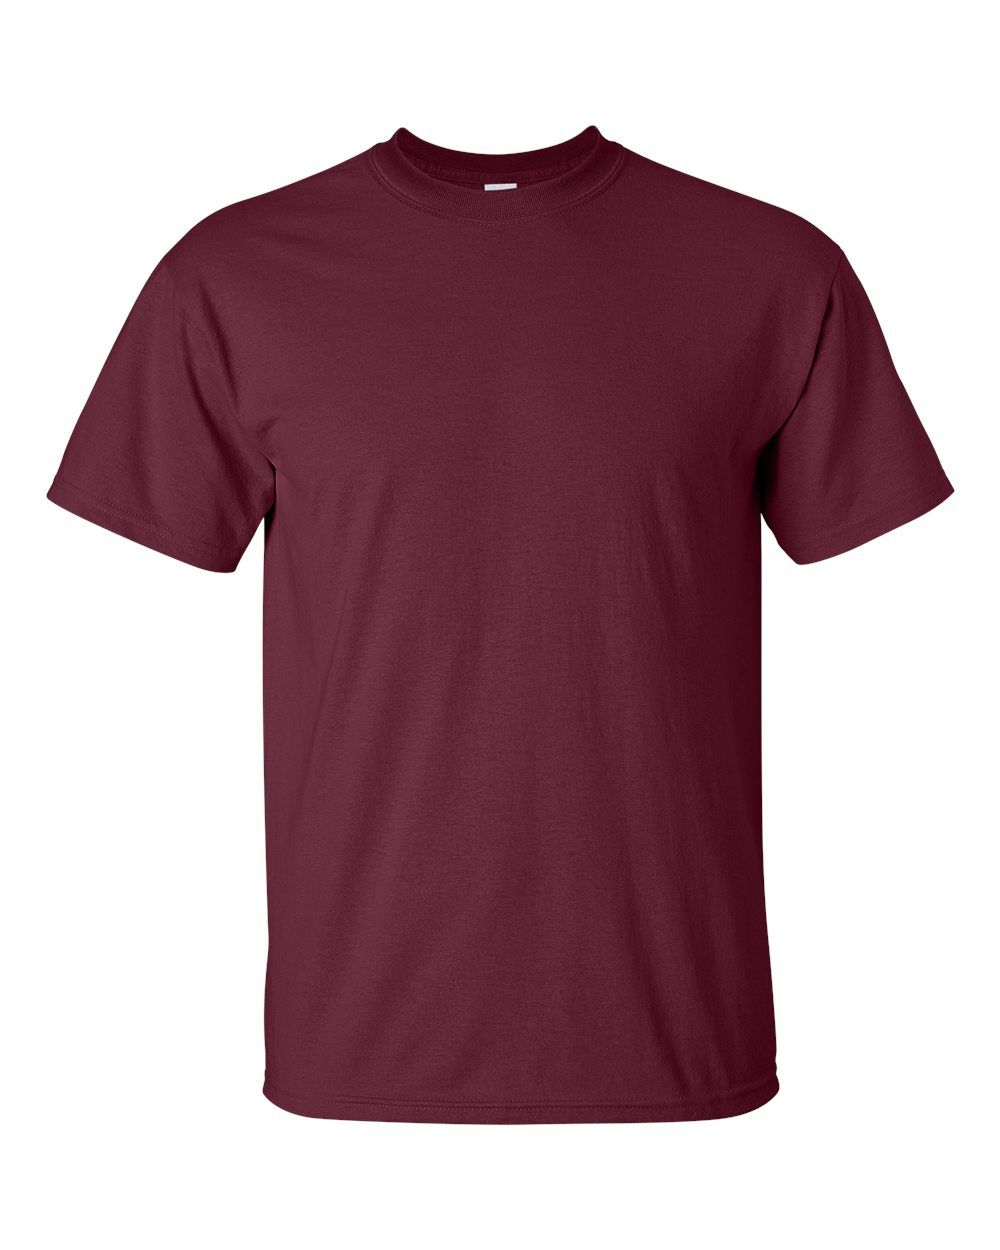 Plain T Shirt Manufacturers In Delhi Mens Plain T Shirts Blank T Shirts Shirts